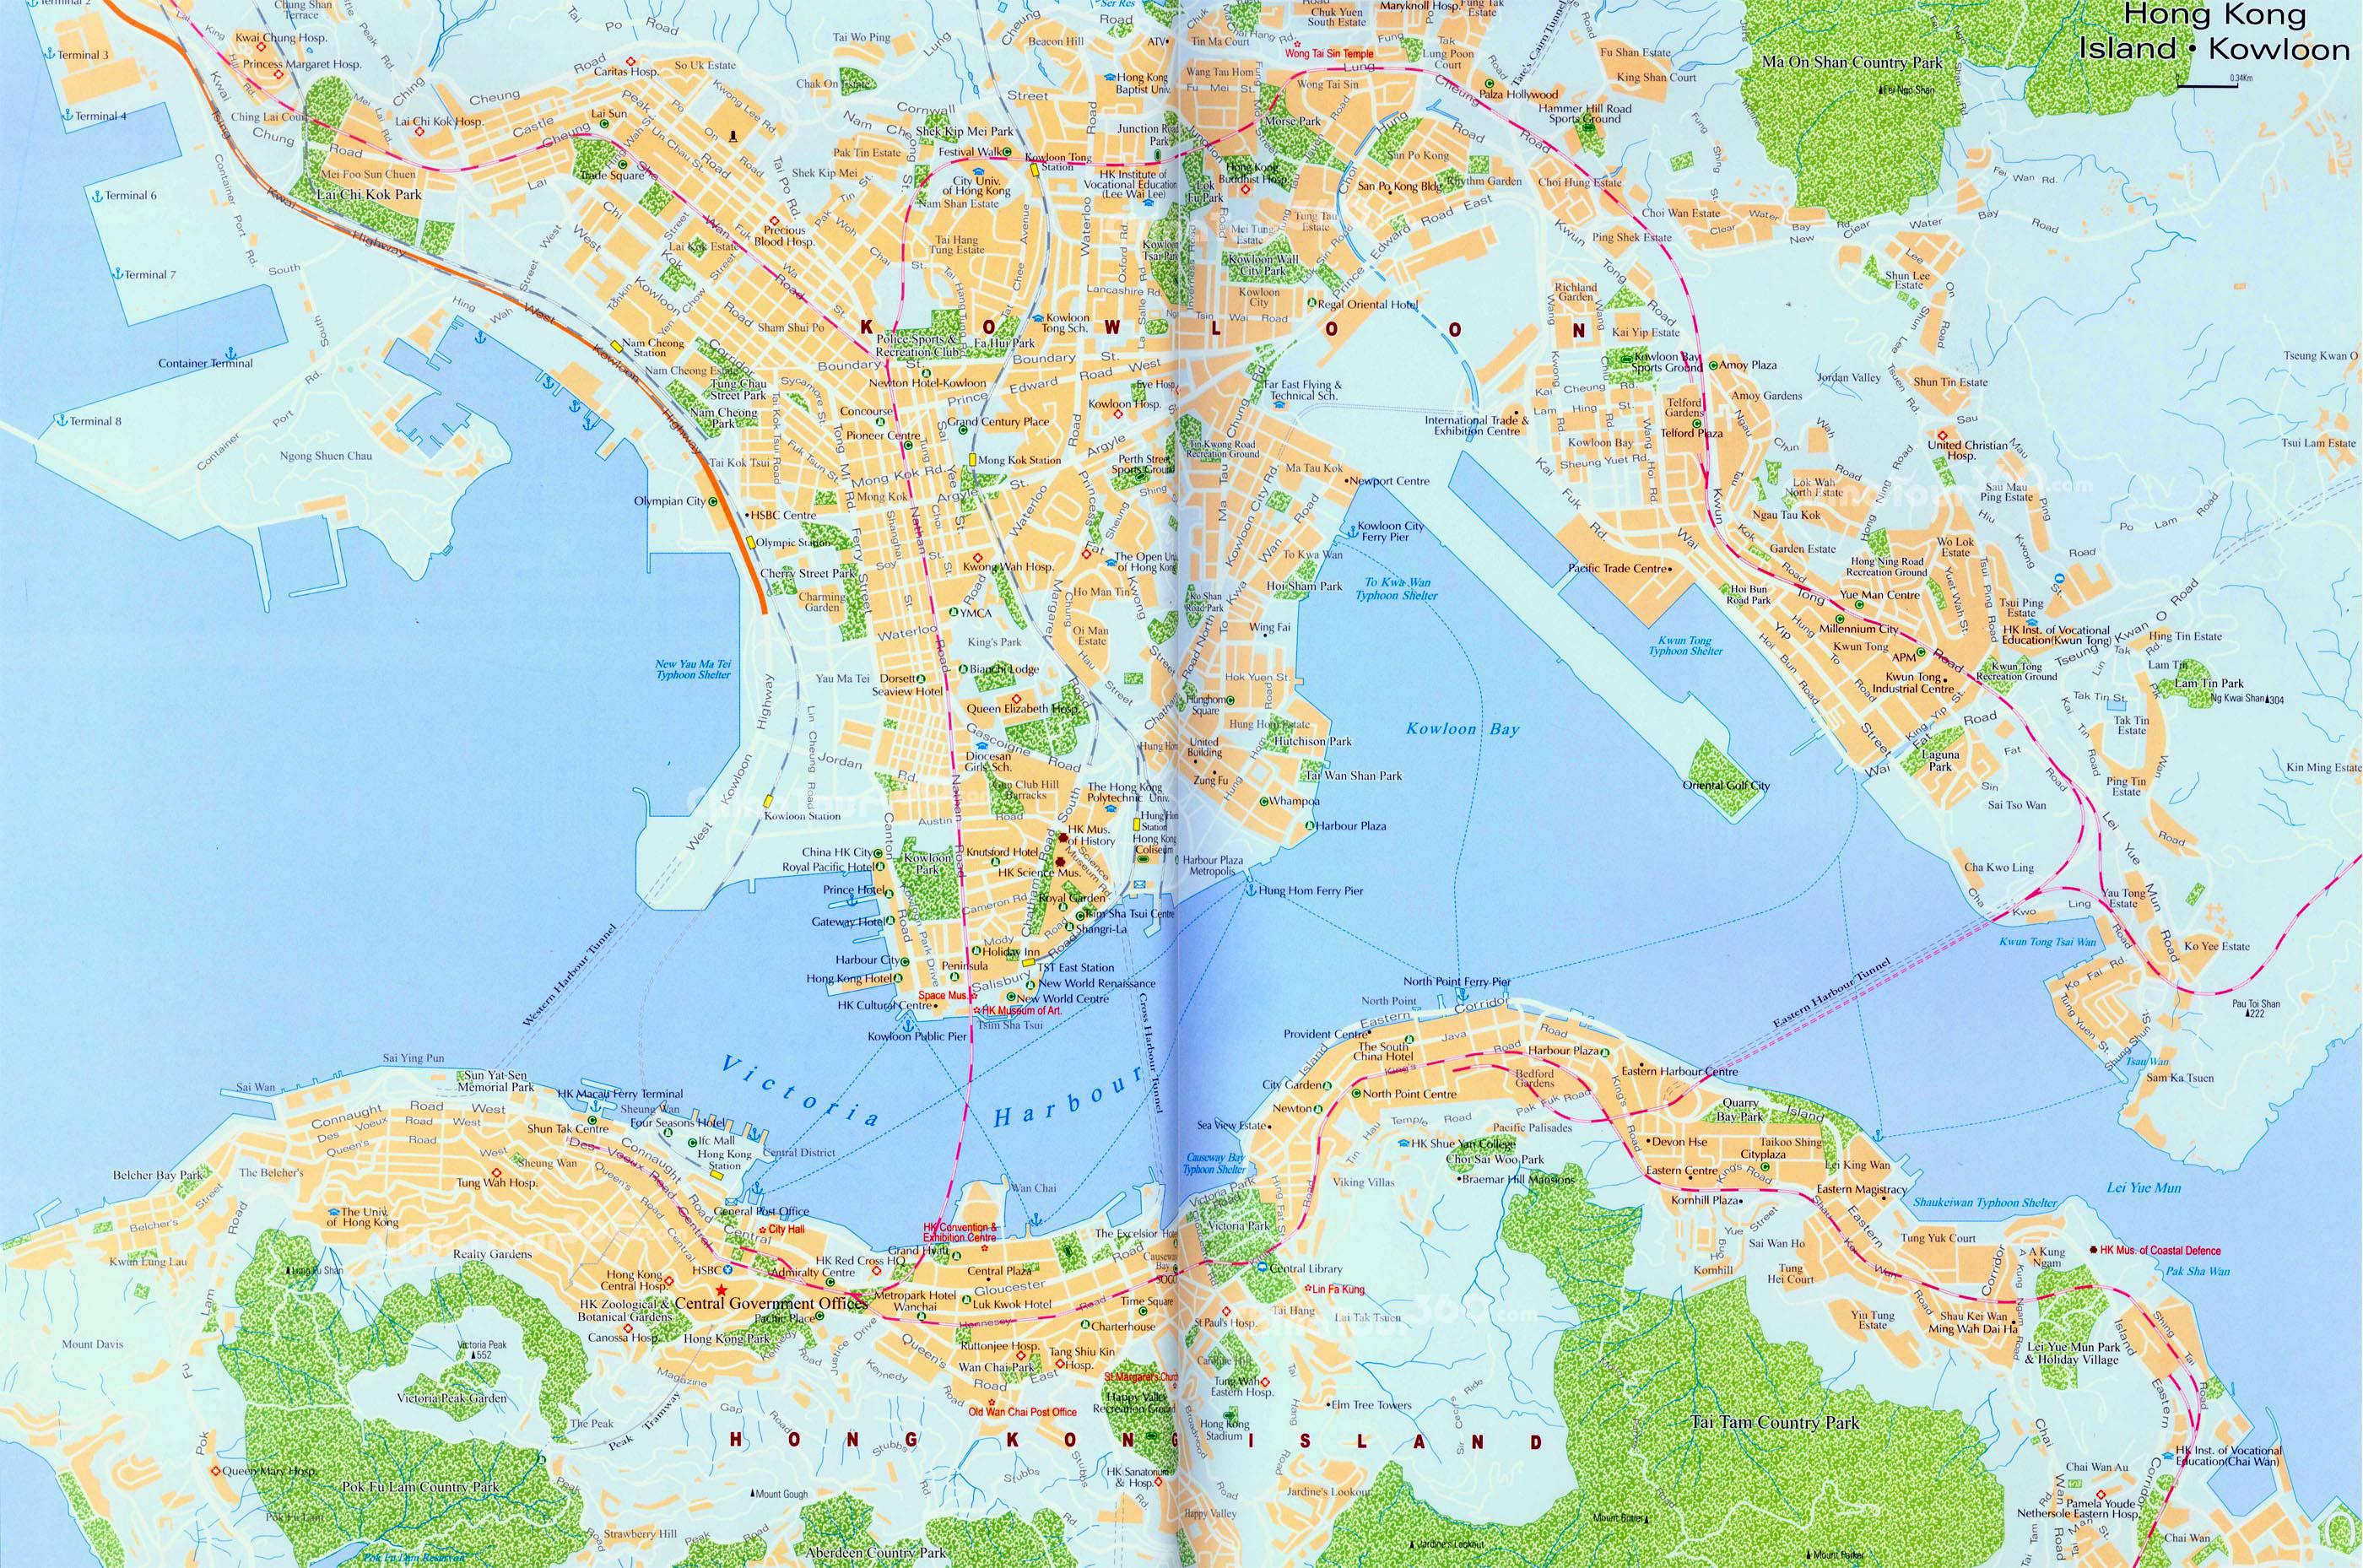 Maps Of Hong Kong Detailed Map Of Hong Kong In English Tourist